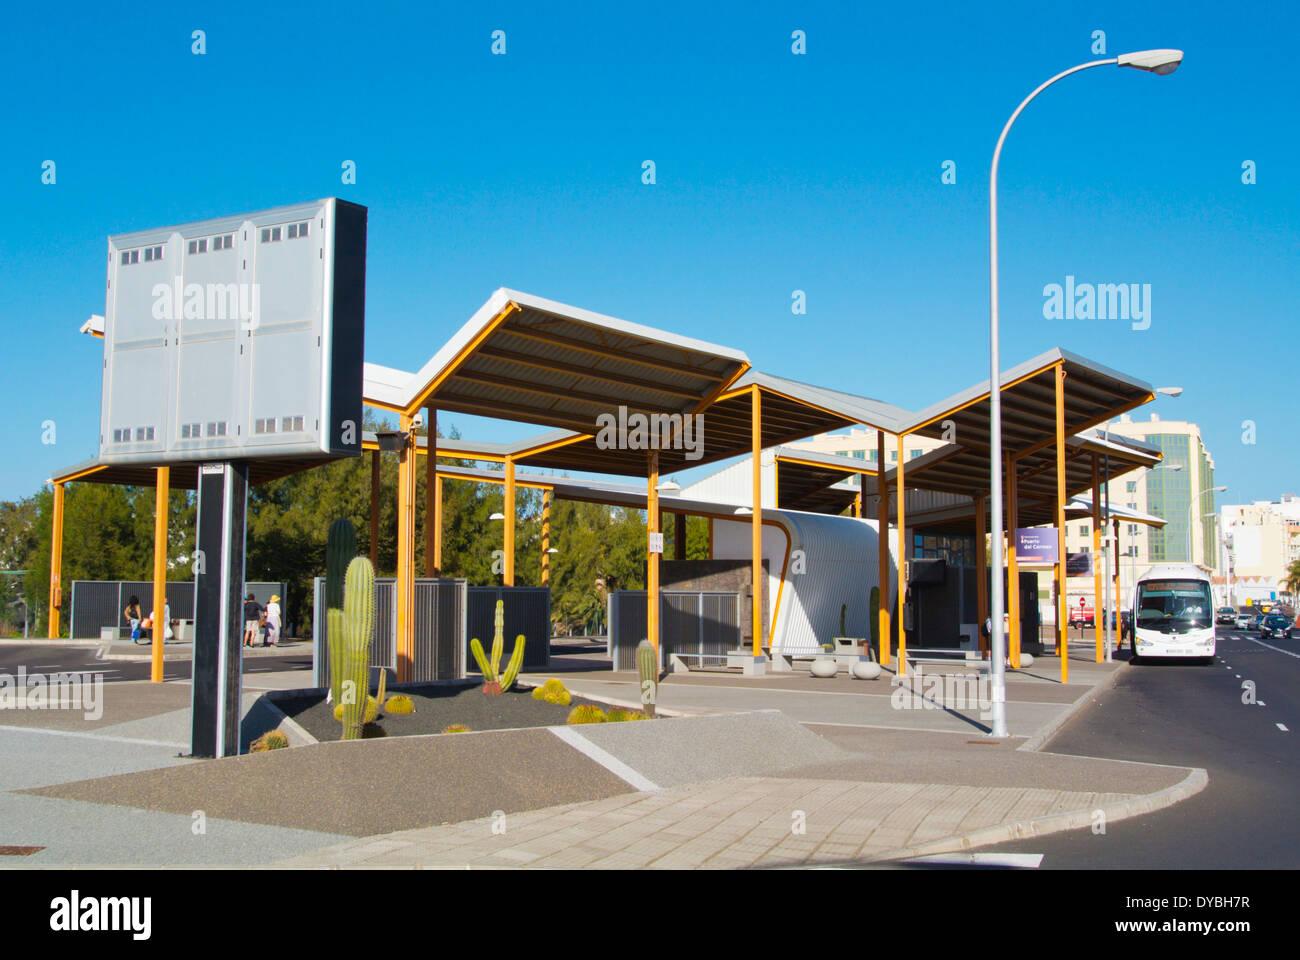 Bus station, Arrecife, Lanzarote, Canary Islands, Spain, Europe - Stock Image